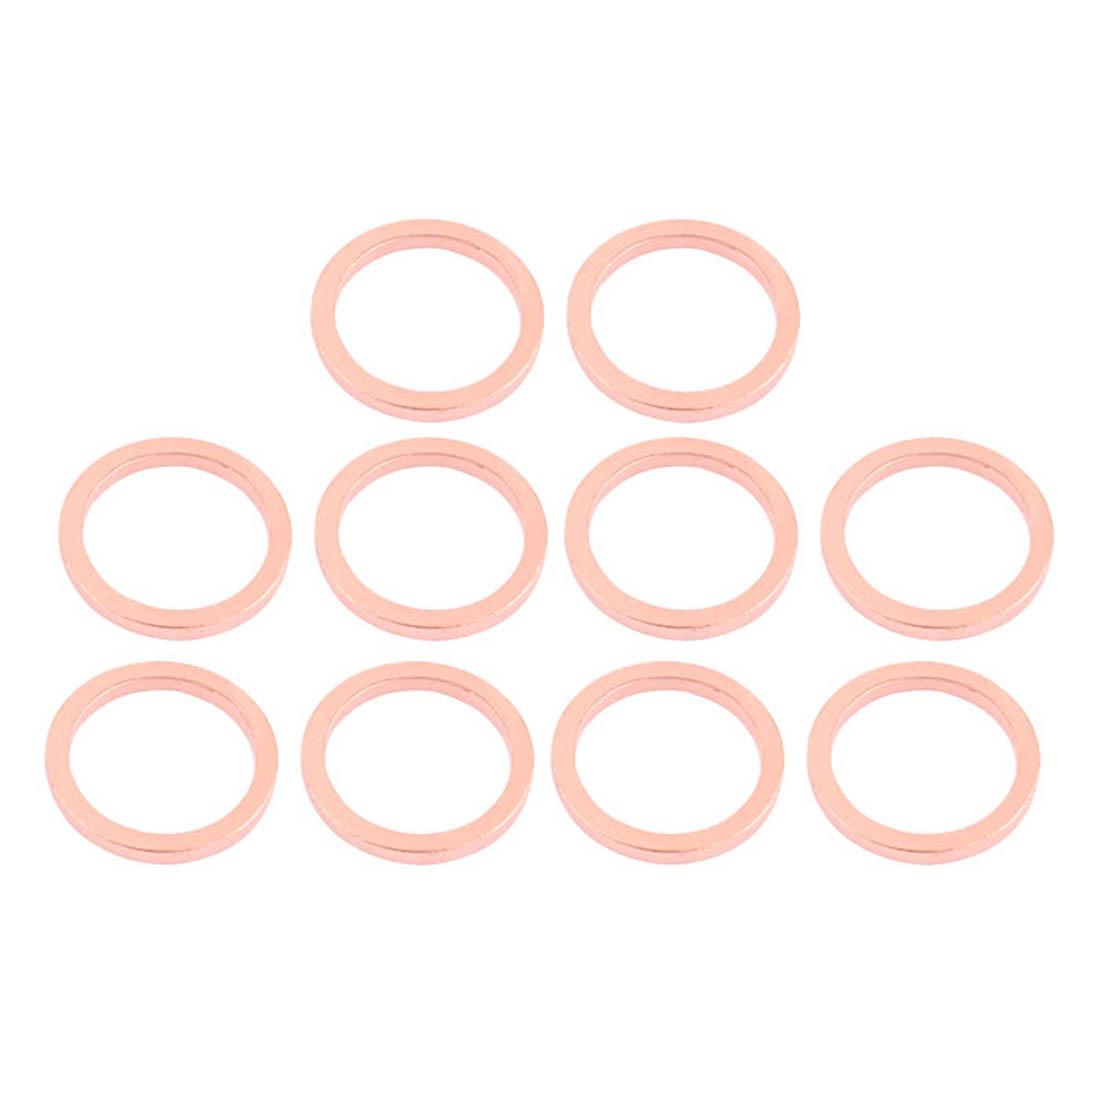 10pcs 20mm x 14mm x 2mm Flat Ring Copper Crush Washer Sealing Gasket Fastener